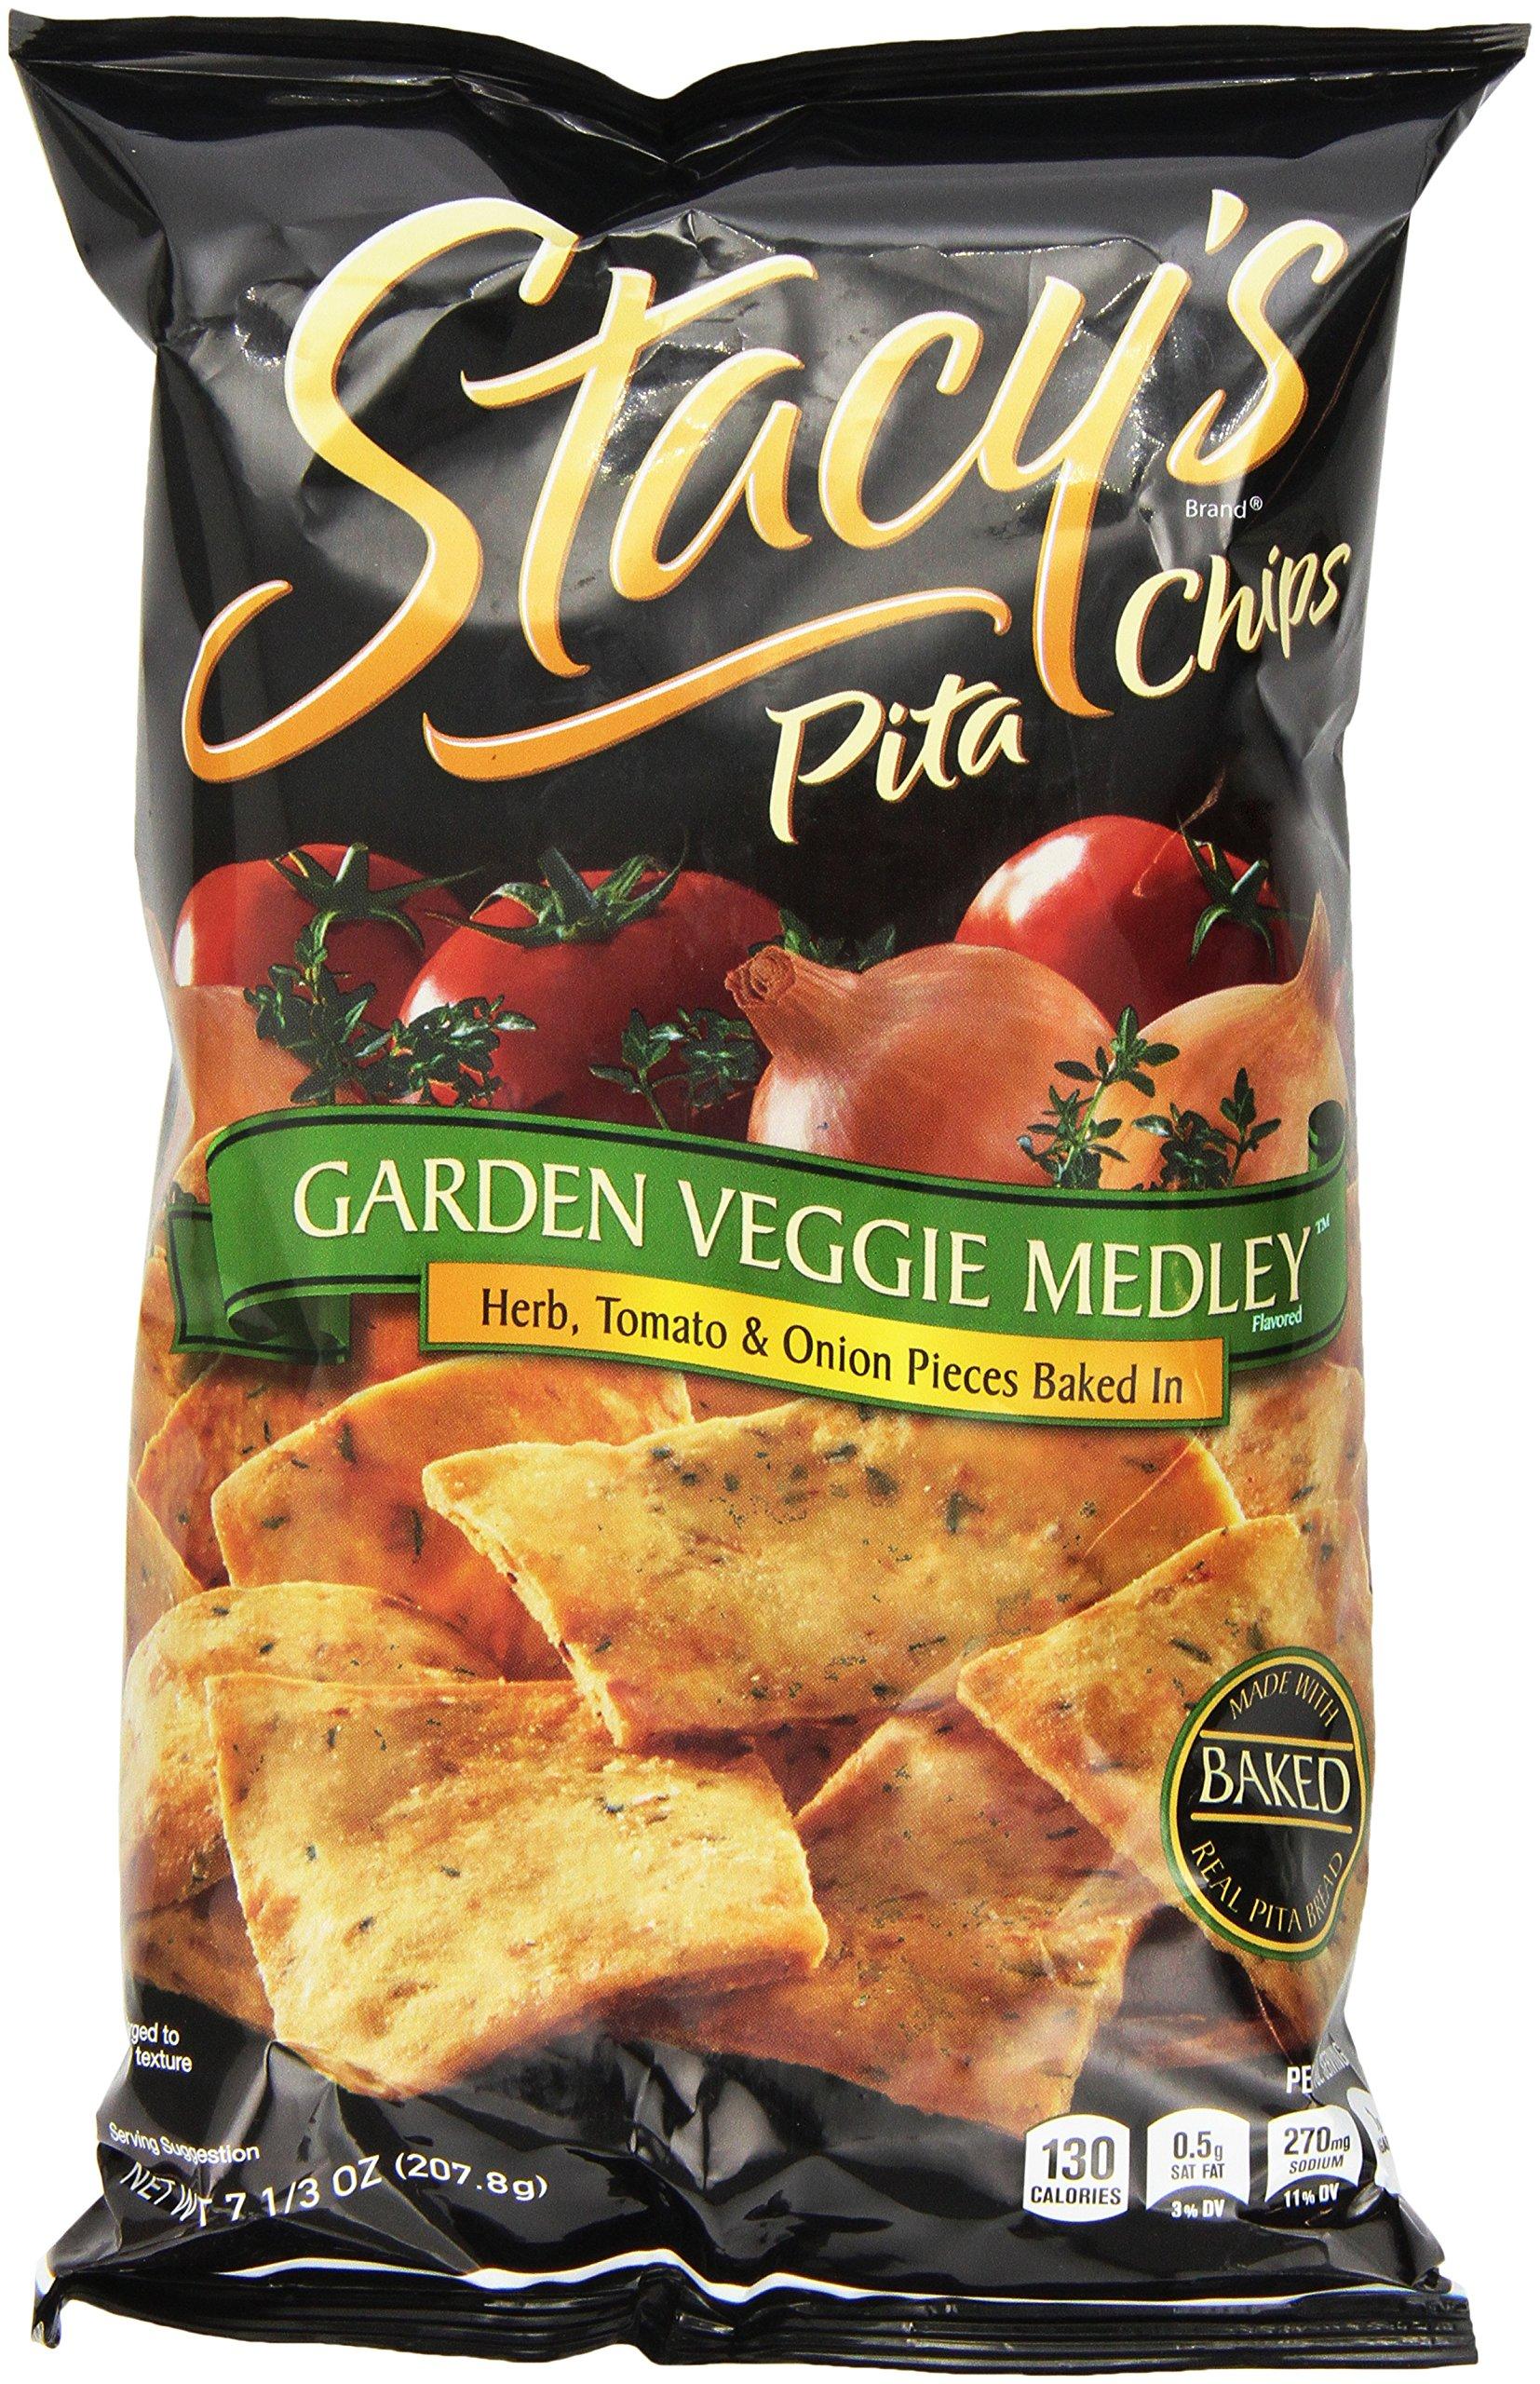 Stacy's Pita Chips, Garden Veggie Medley, 7.3 Ounce (Pack of 6)